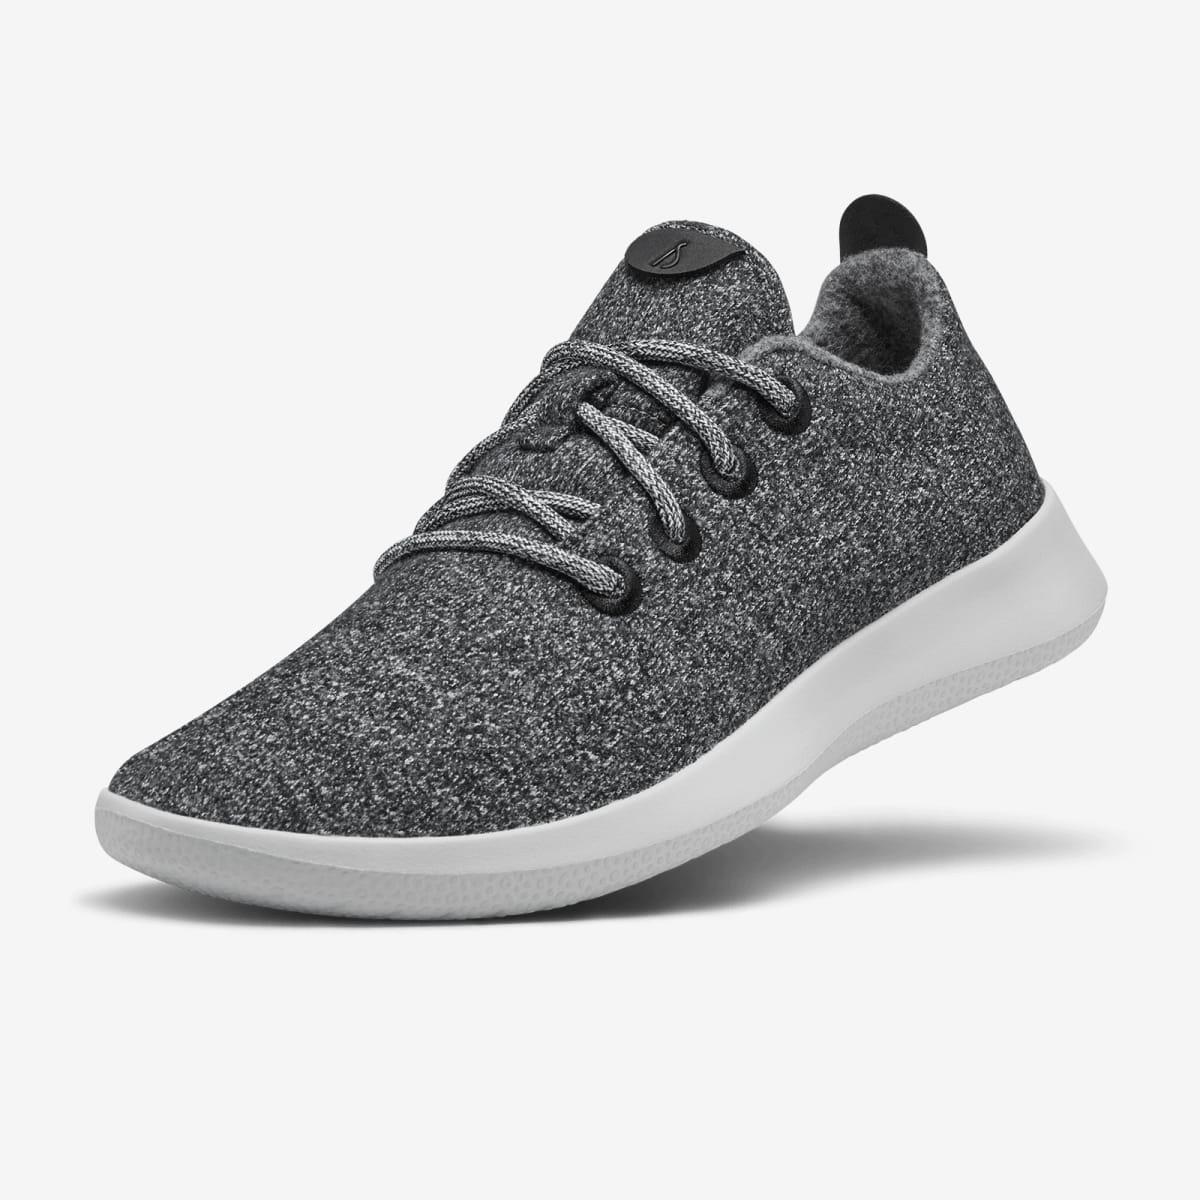 All Birds Men's Wool Runner sneaker in grey